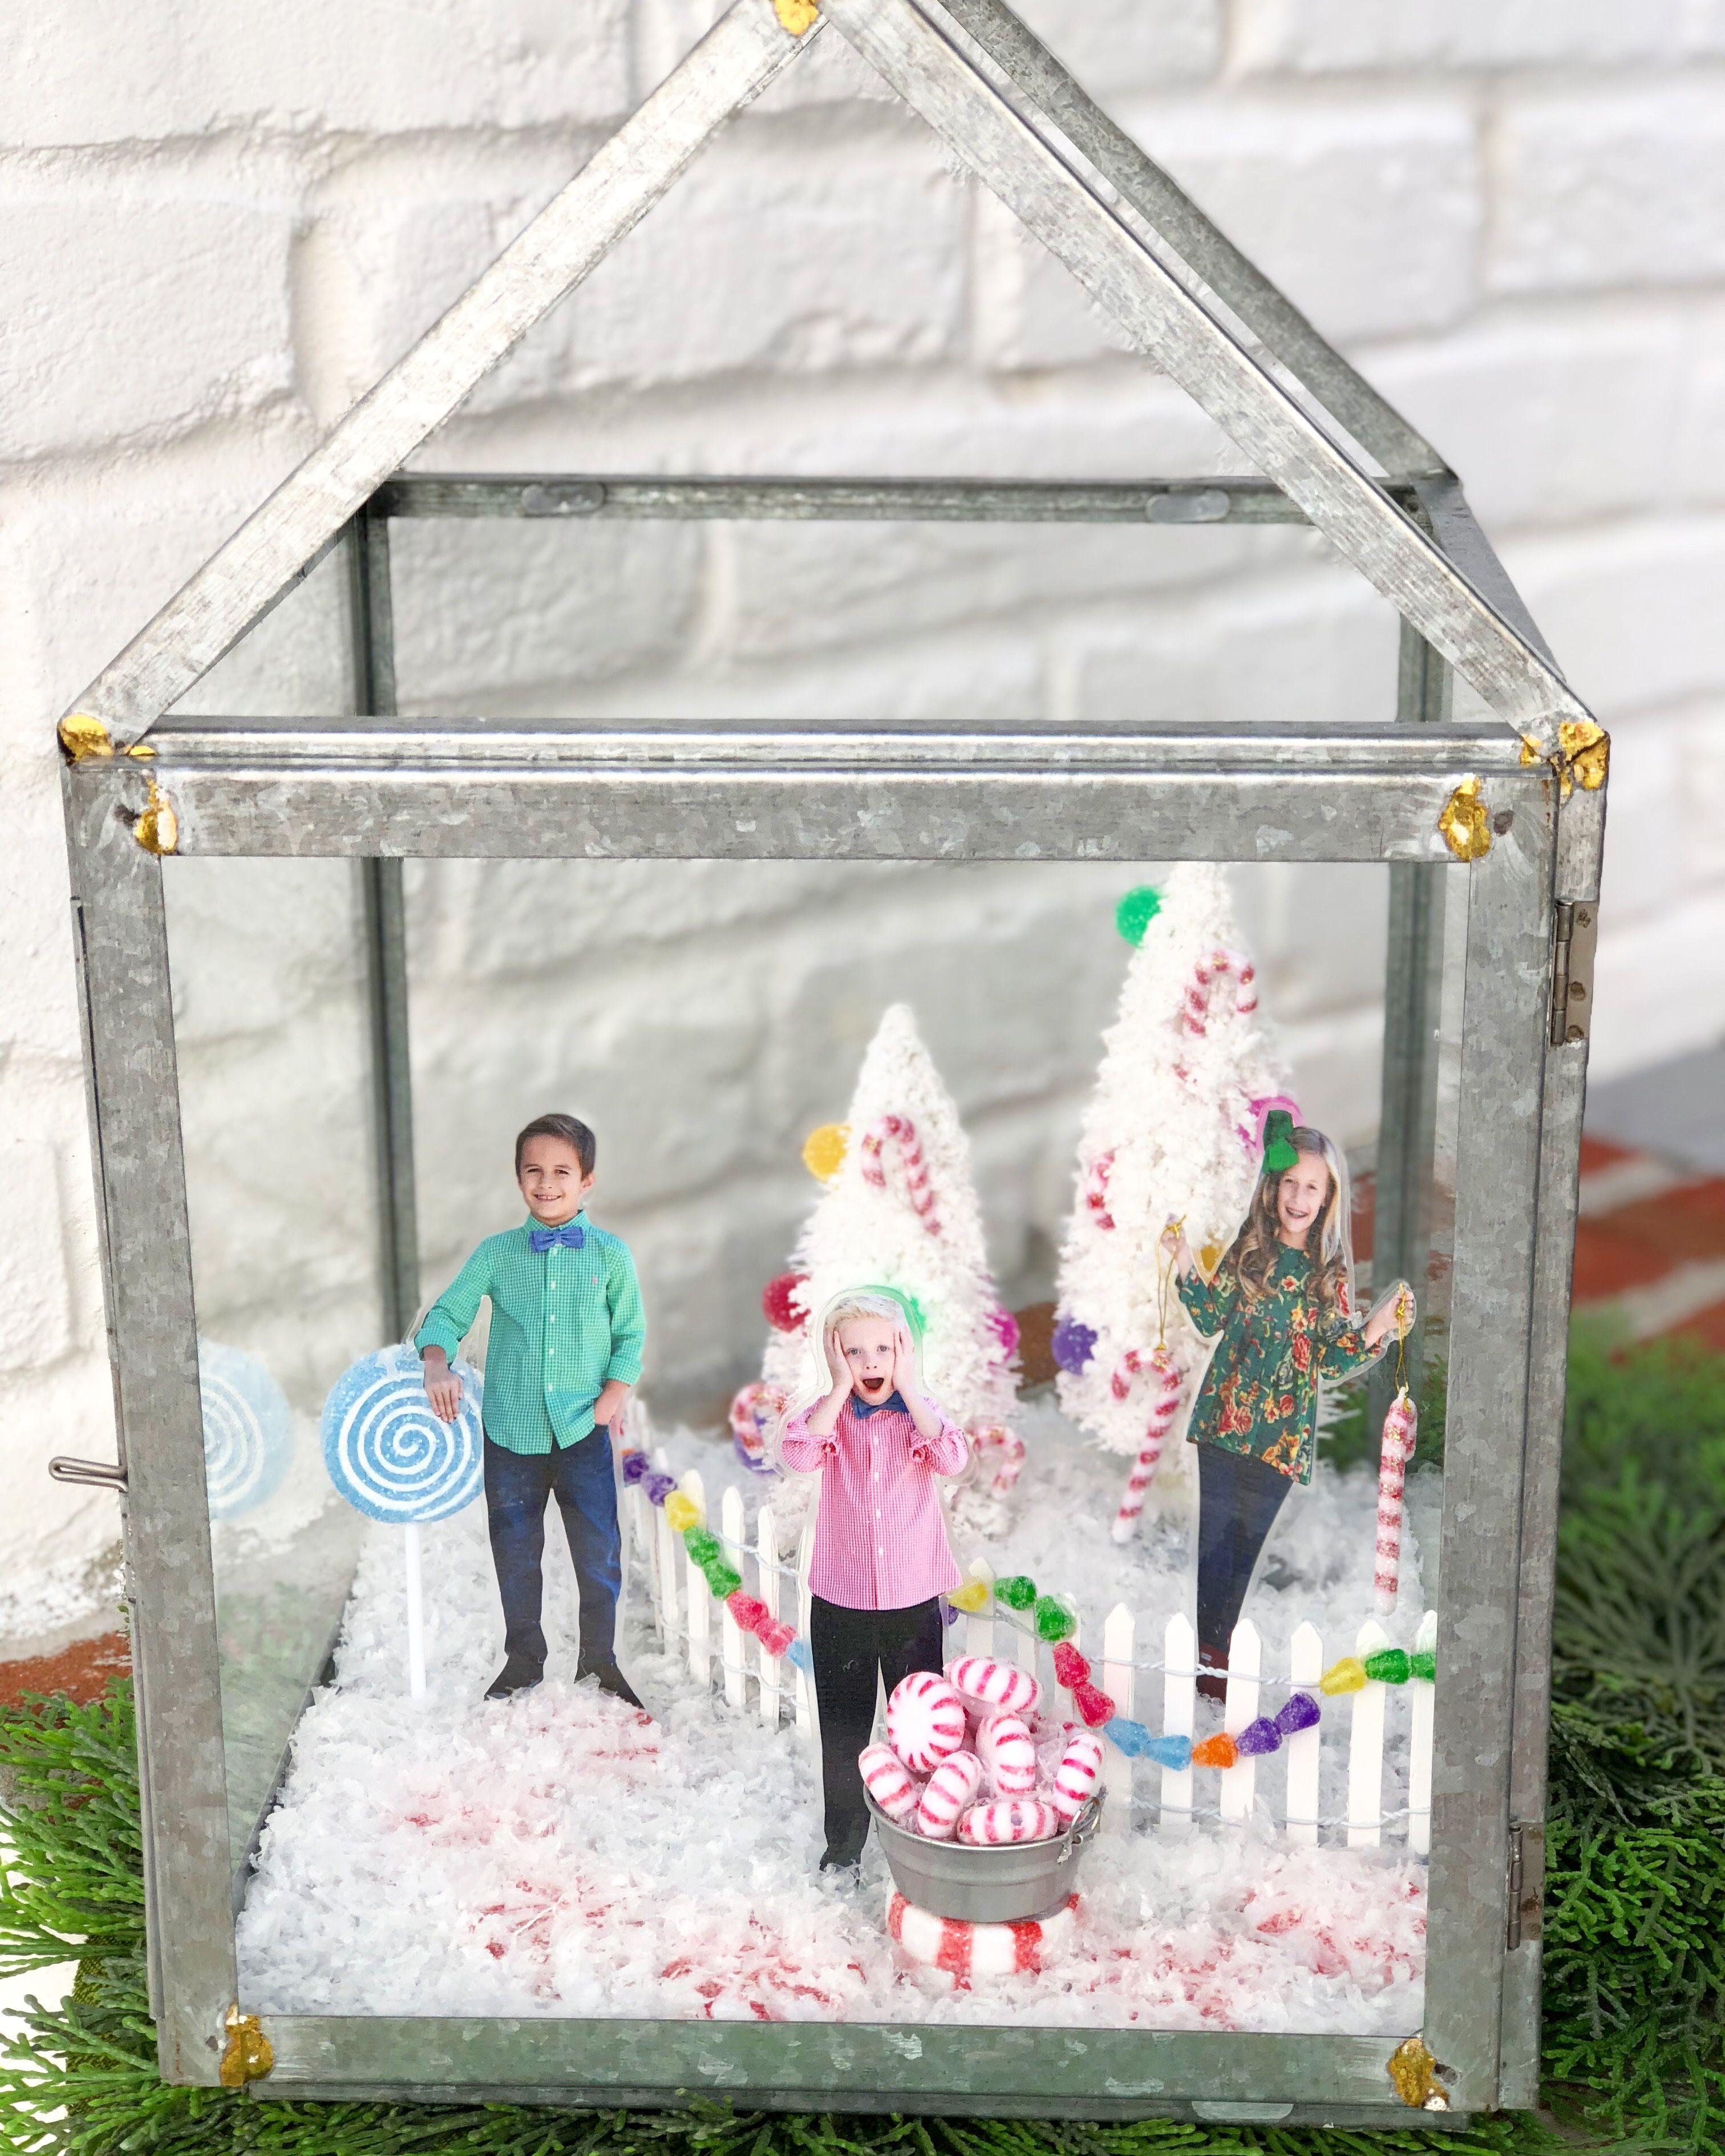 DIY PHOTO SNOWGLOBE SNOW GLOBE CHRISTMAS CRAFT via